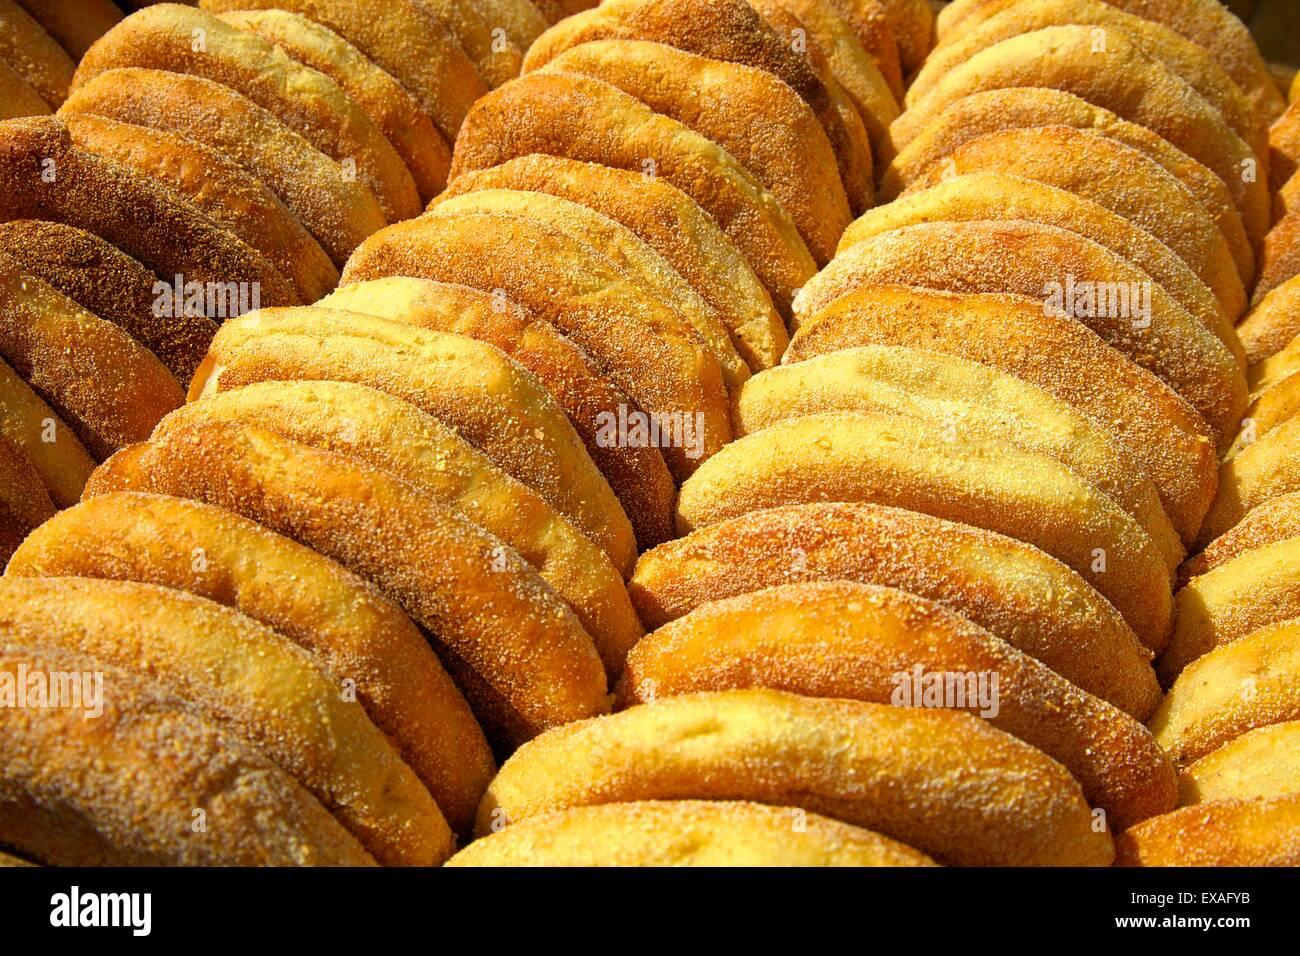 Frisch gebackenes Brot, Rabat, Marokko, Nordafrika, Afrika Stockbild